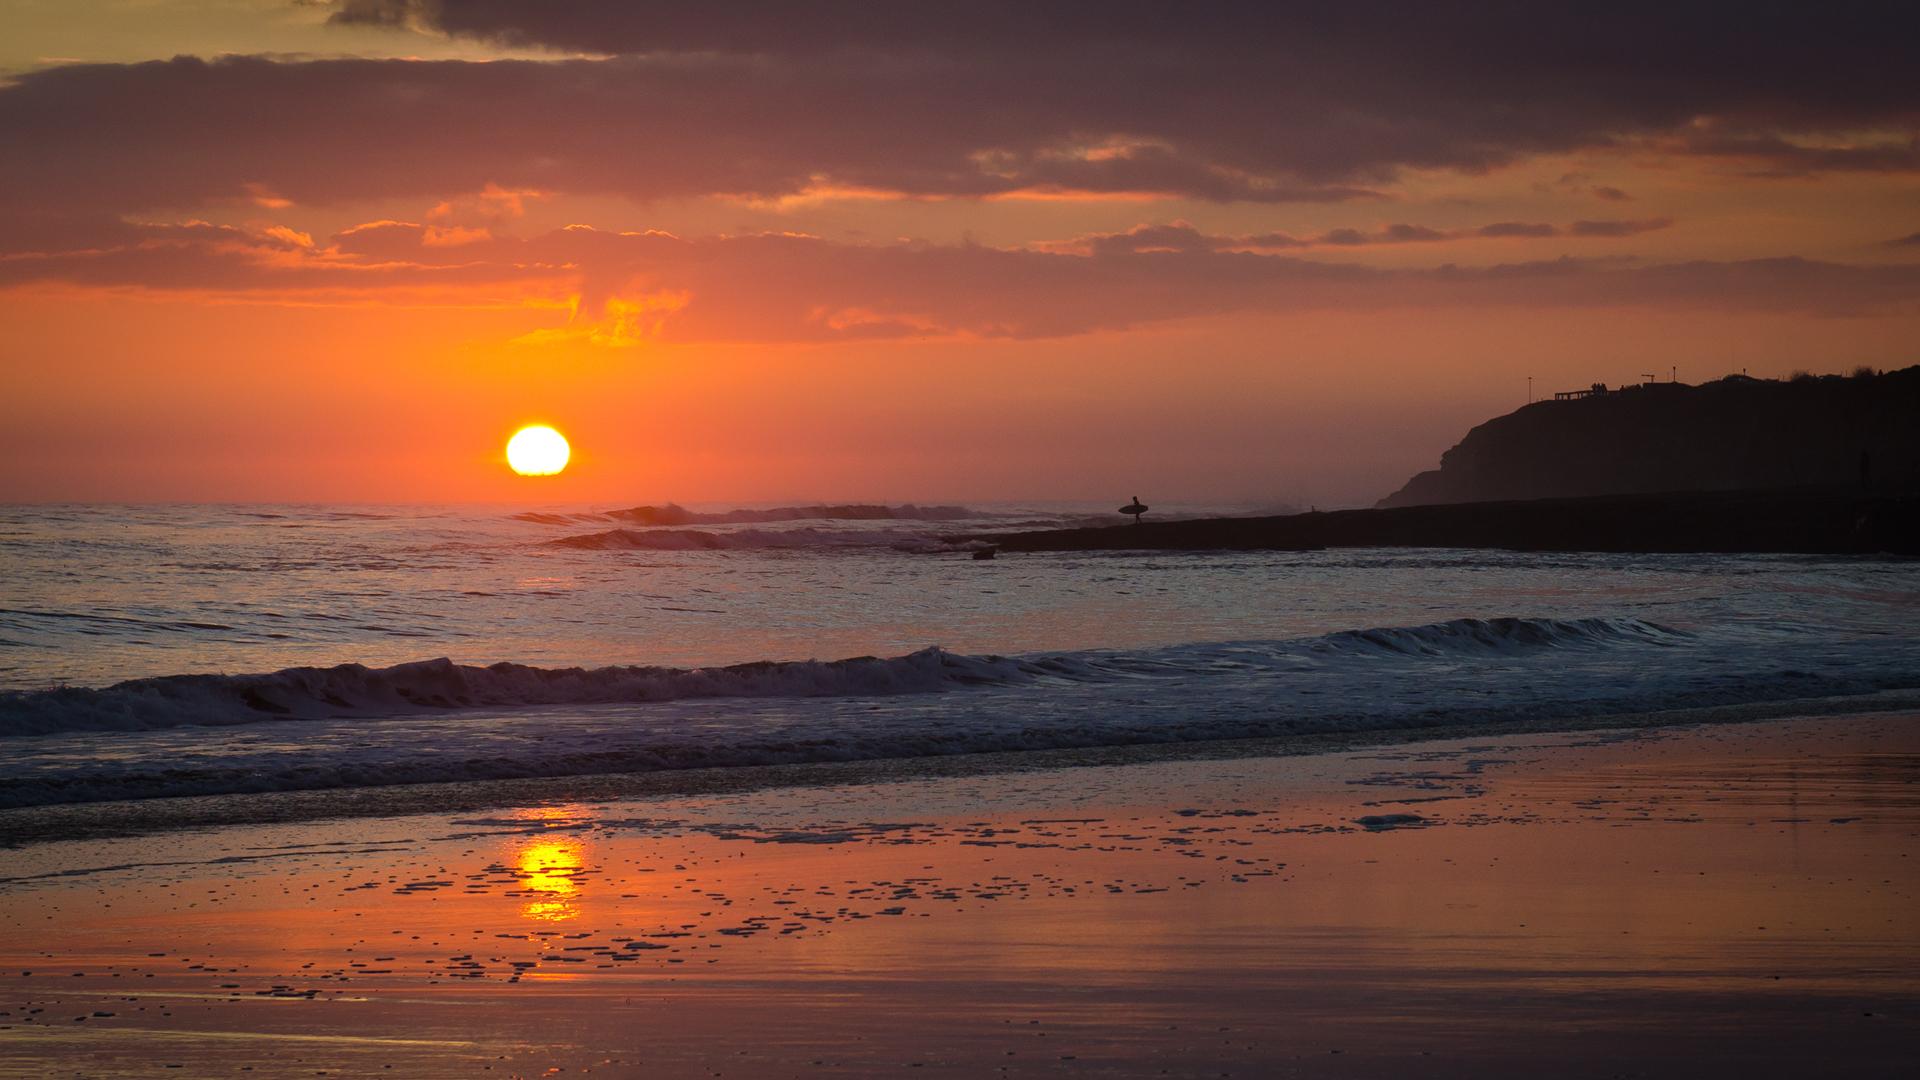 sunset hd wallpaper | background image | 1920x1080 | id:351417